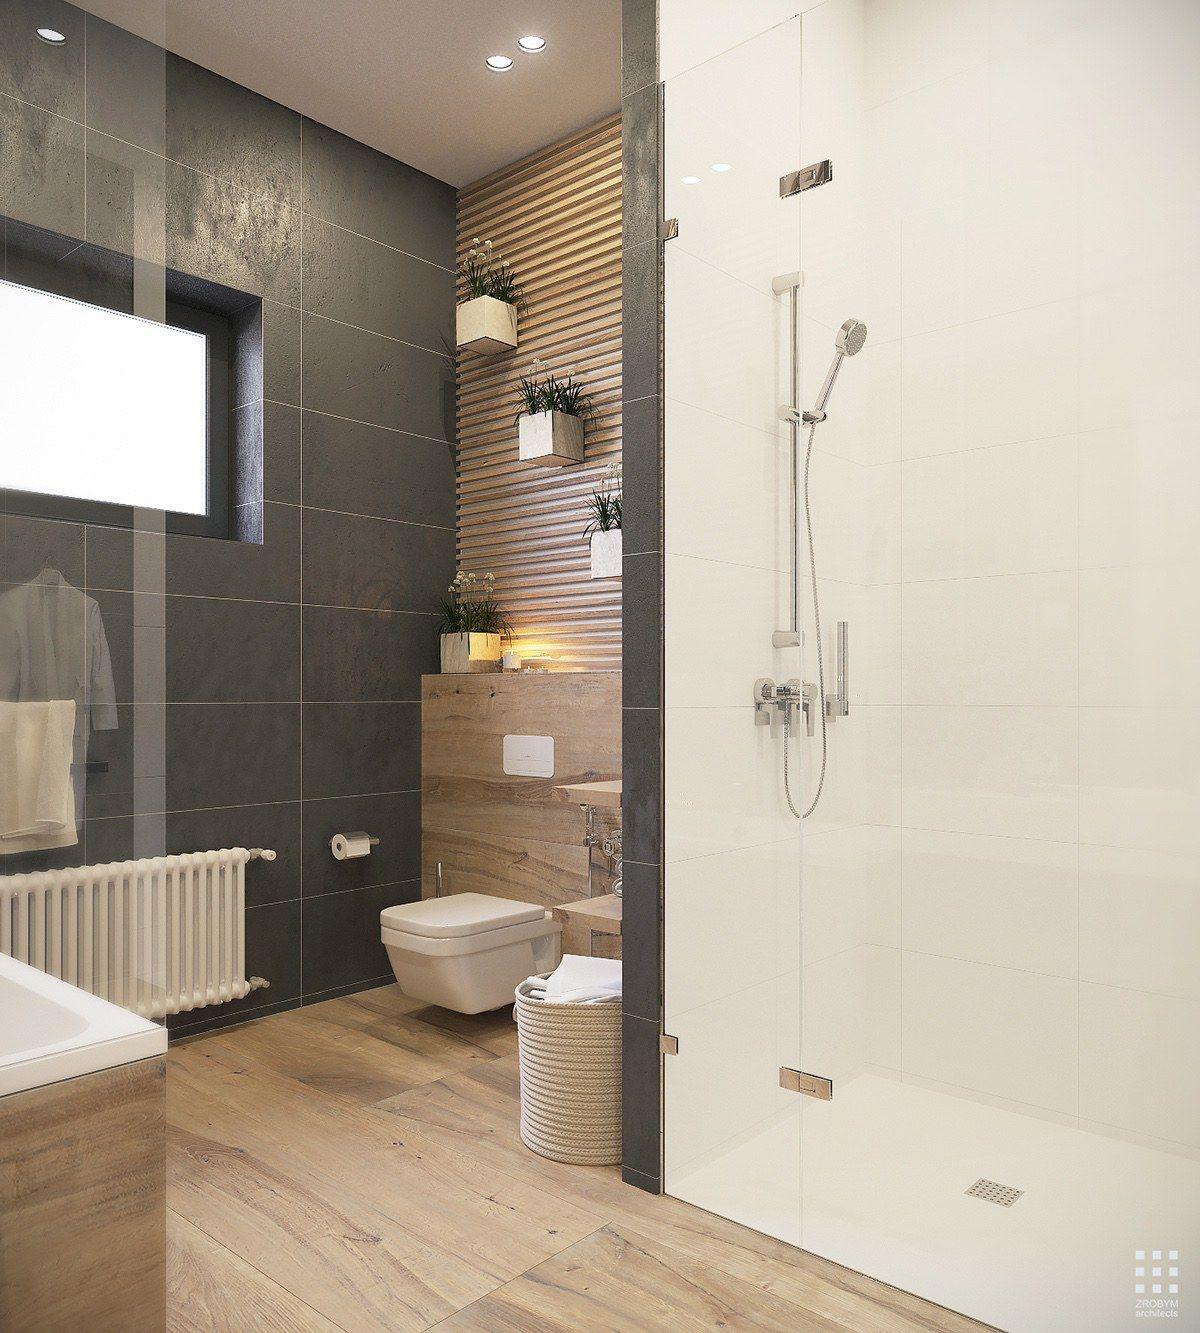 An Organic Modern Home With Subtle Industrial Undertones Bathroom Designs Pinterest